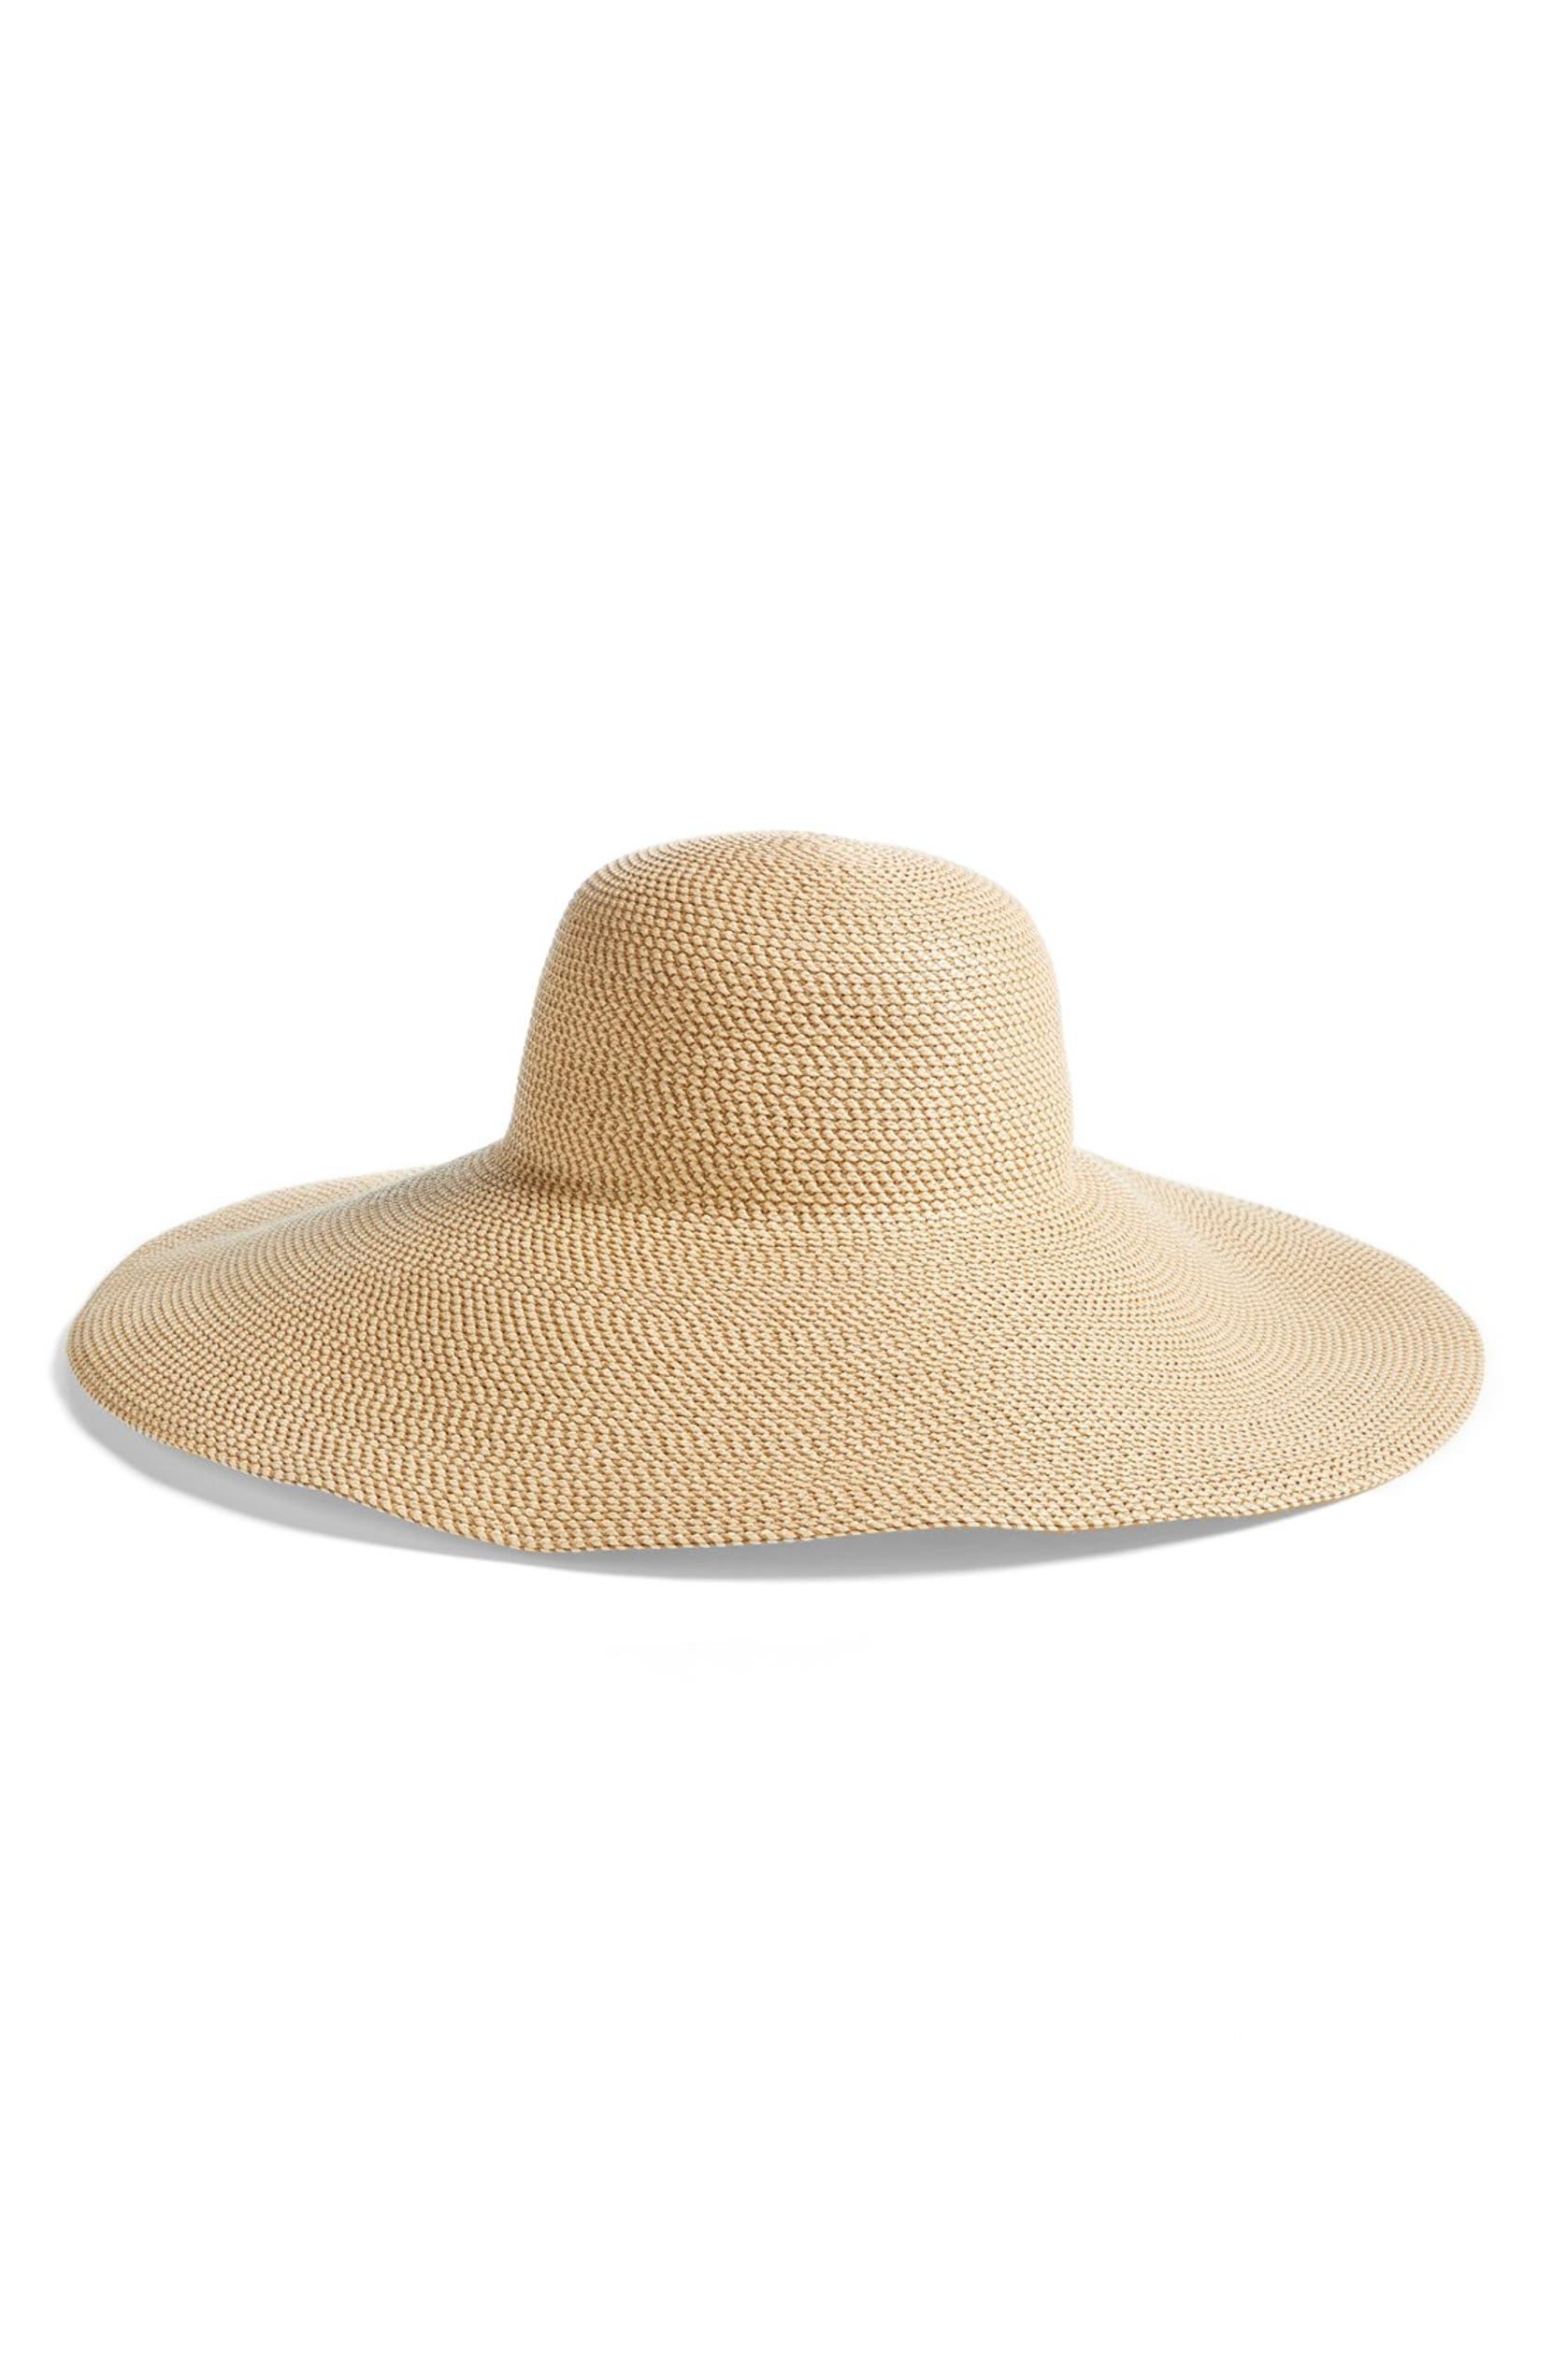 Eric Javits Floppy Straw Hat  de8596ca4f4e